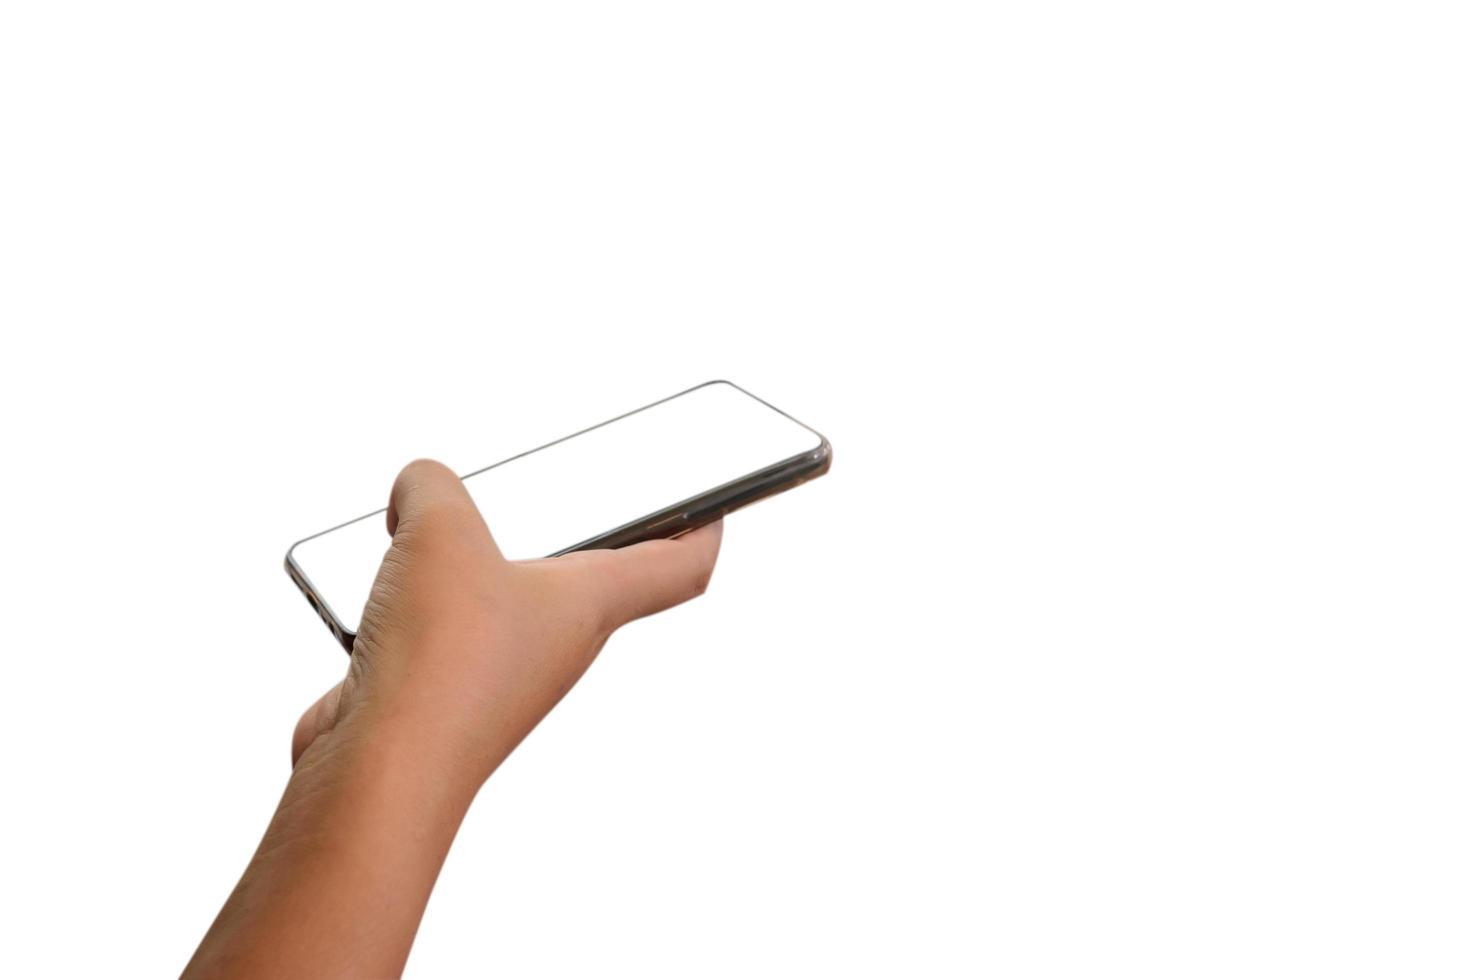 Mano sujetando un teléfono inteligente sobre fondo blanco. foto